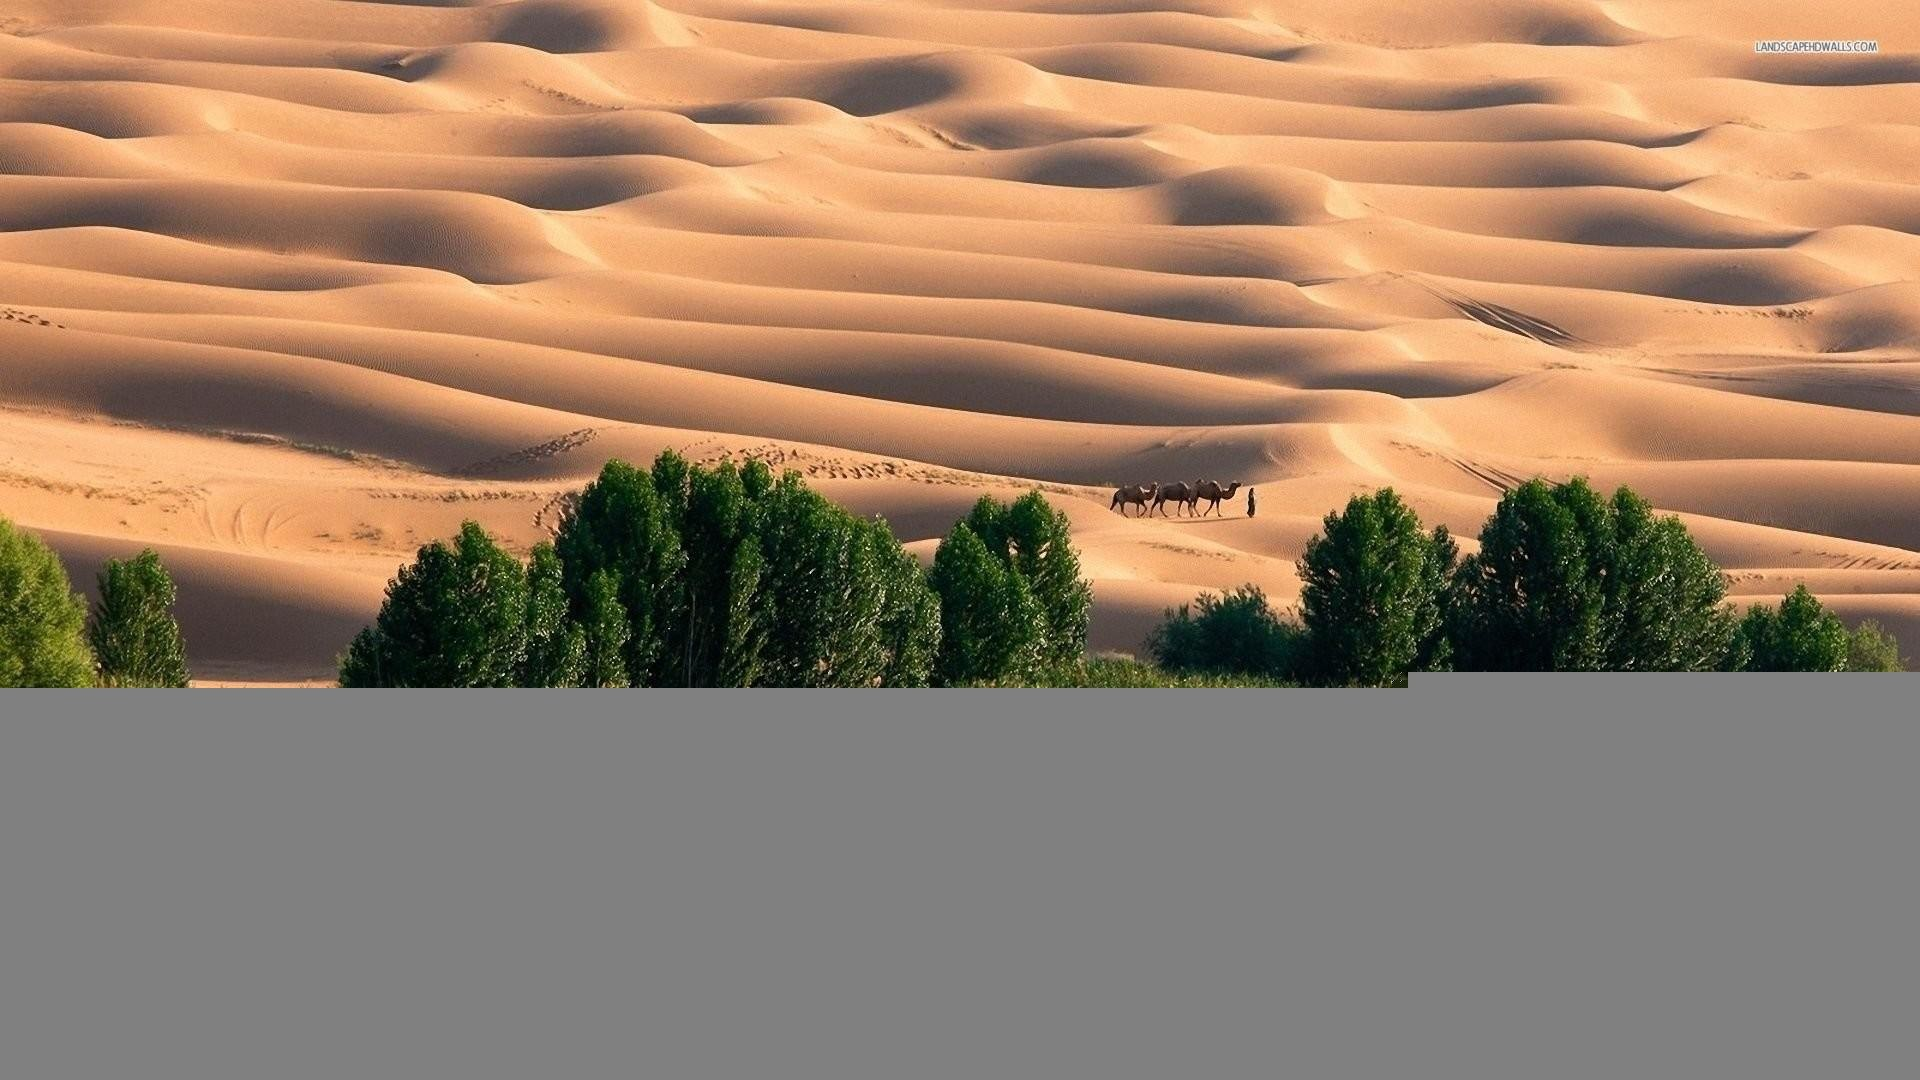 Res: 1920x1080, oasis wallpaper hd #721119